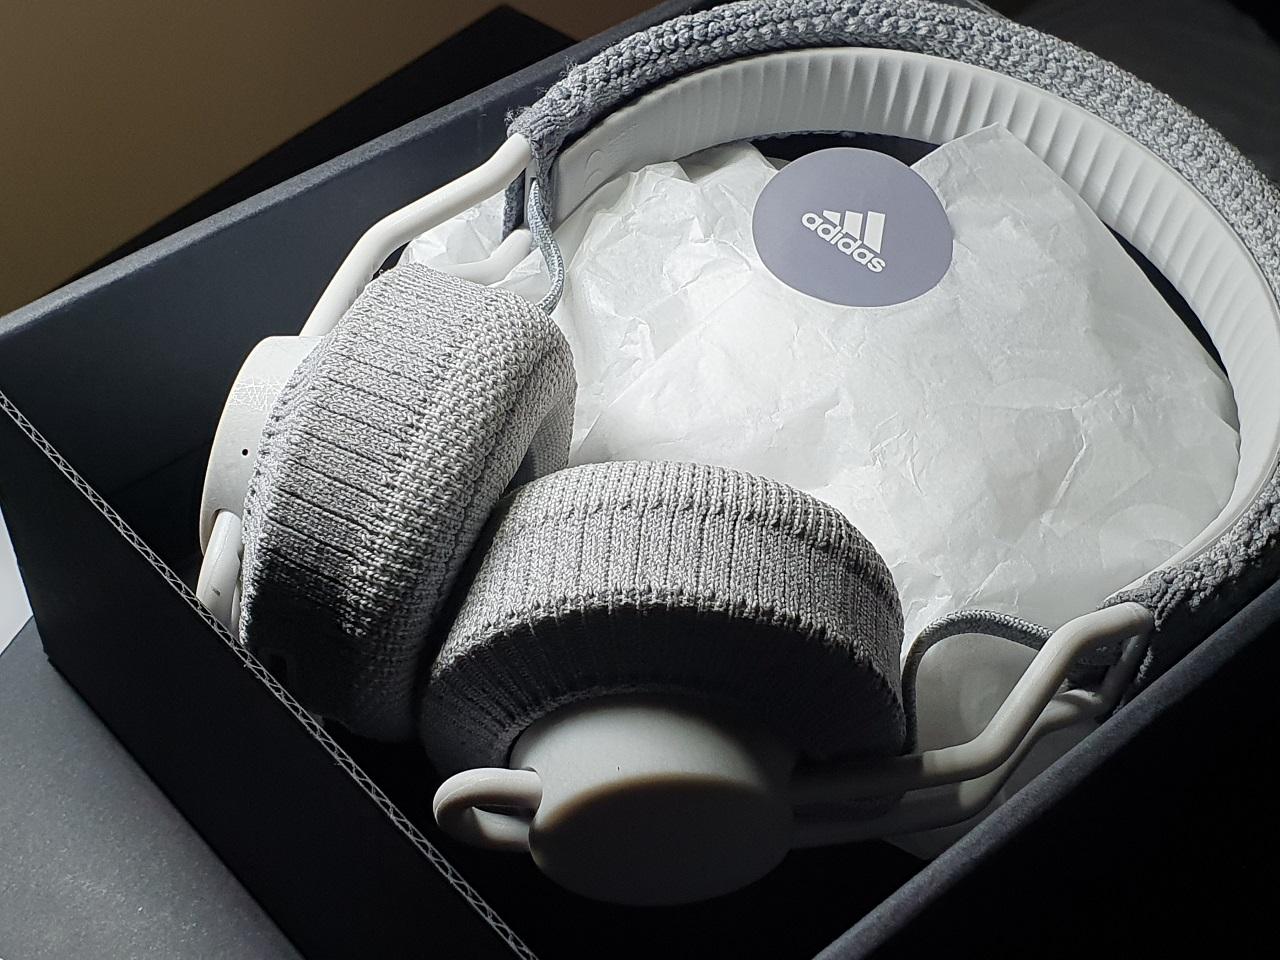 Adidas RPT 01 3